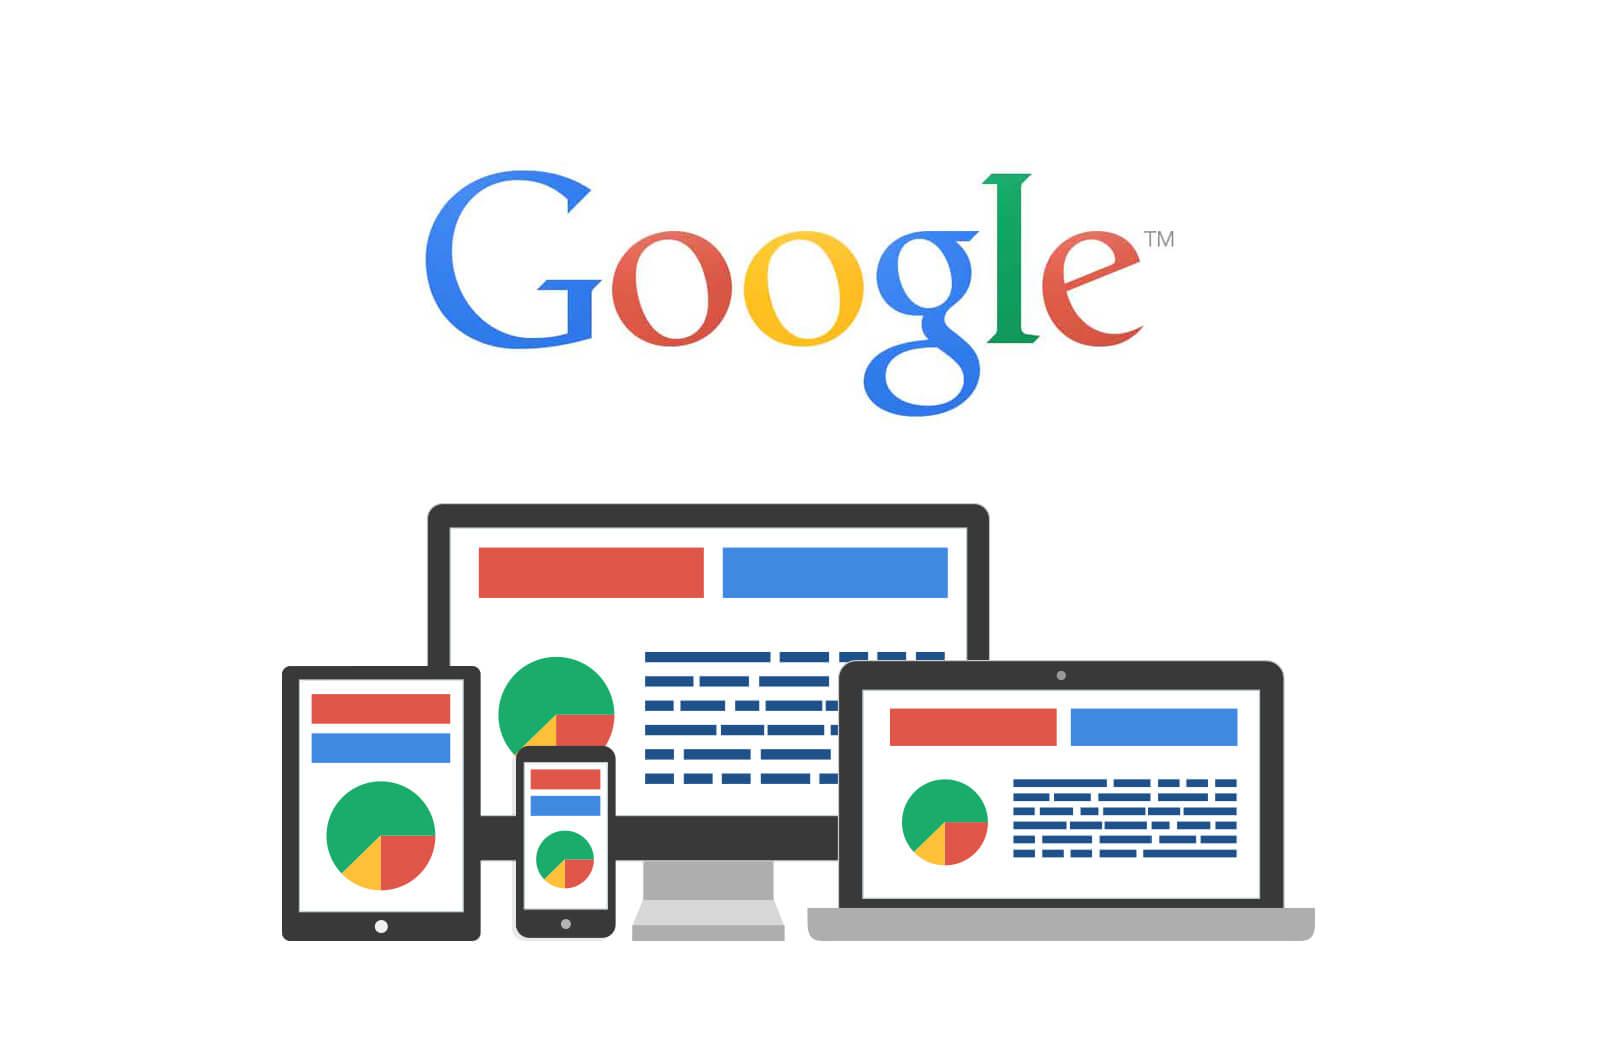 google-responsive-website-design-even-more-important